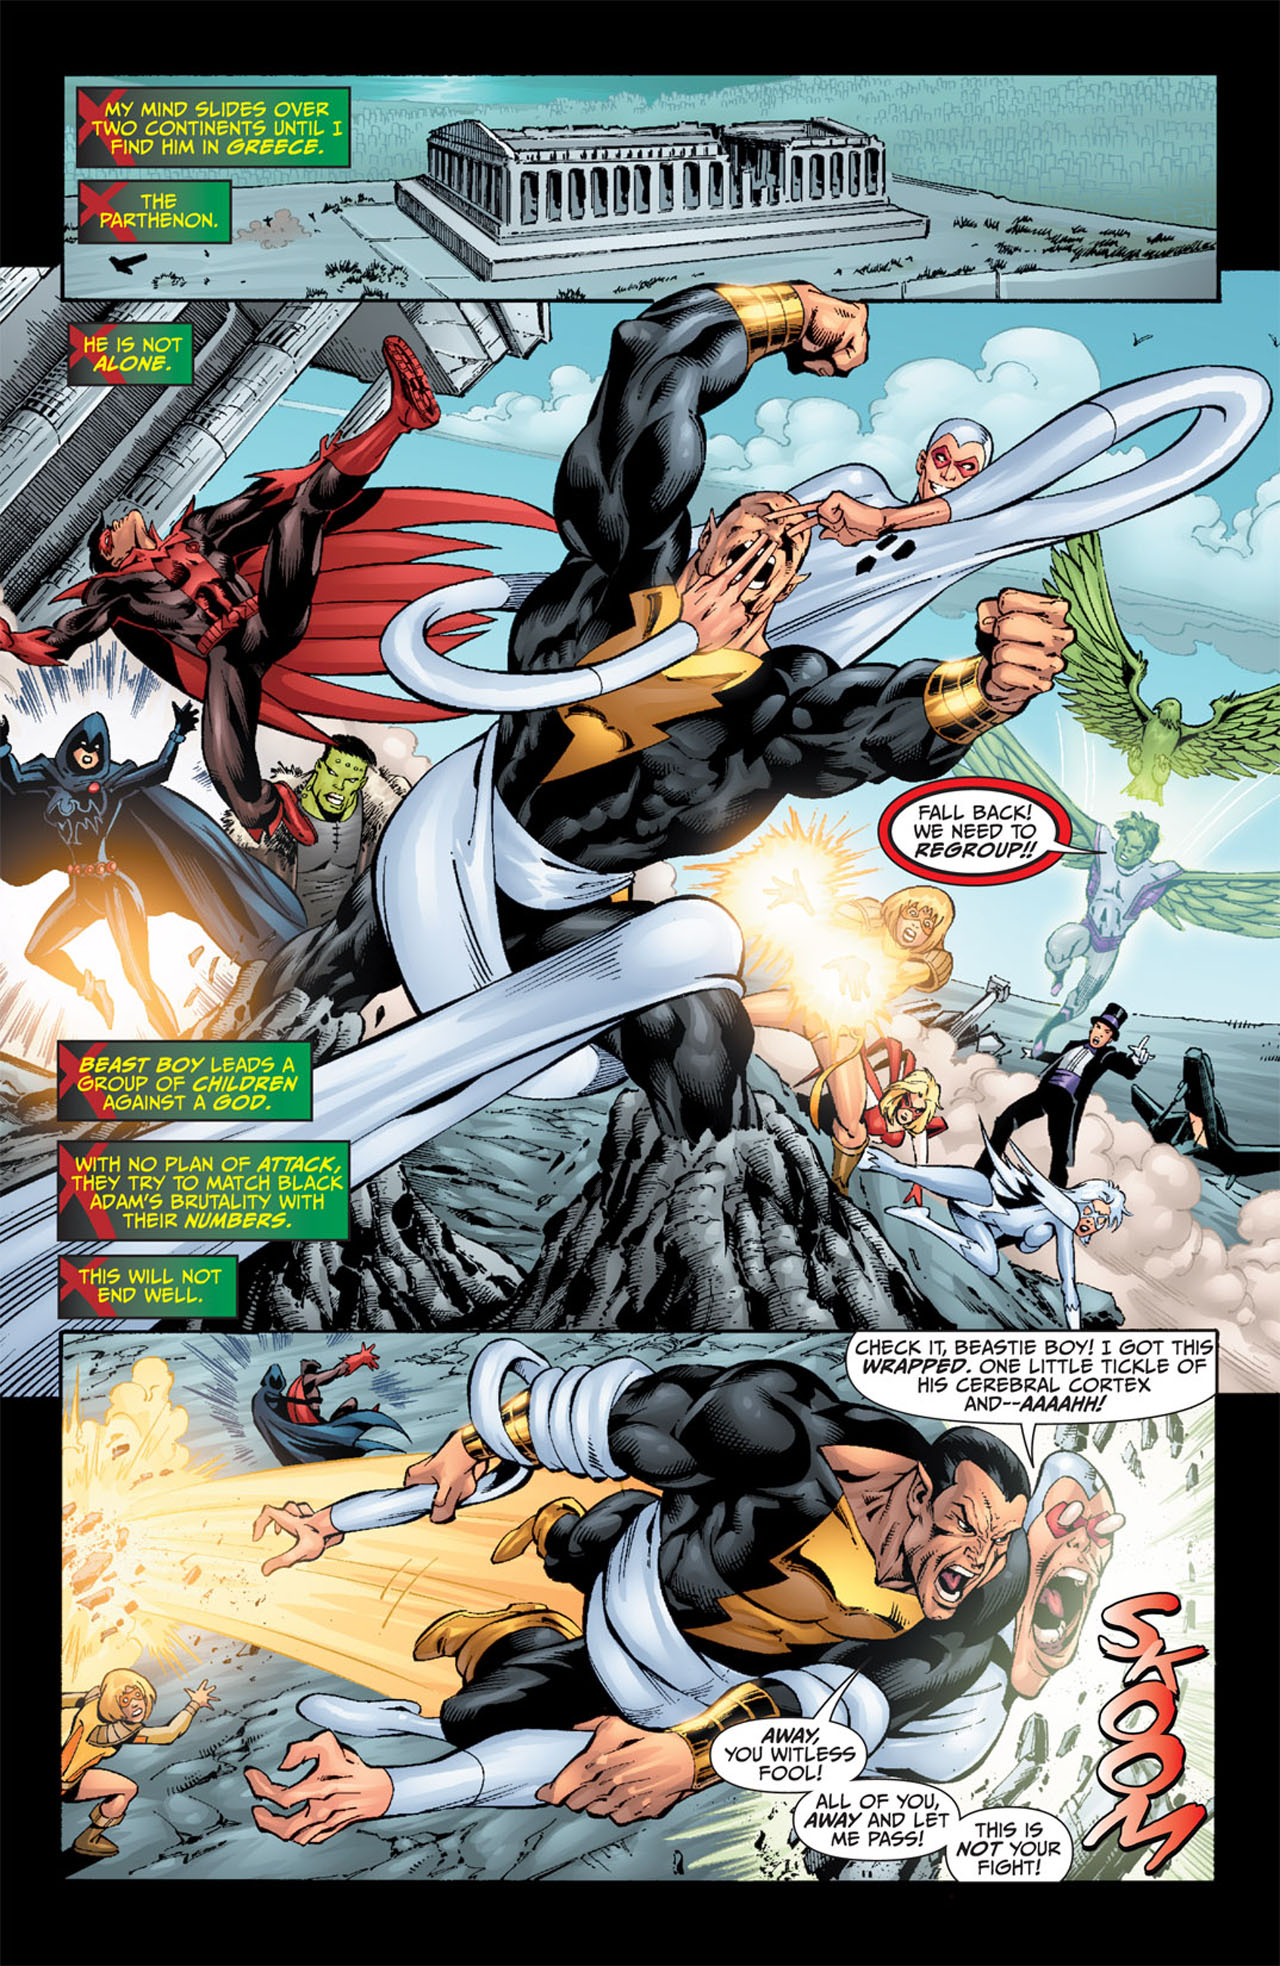 Read online World War III comic -  Issue #3 - 7